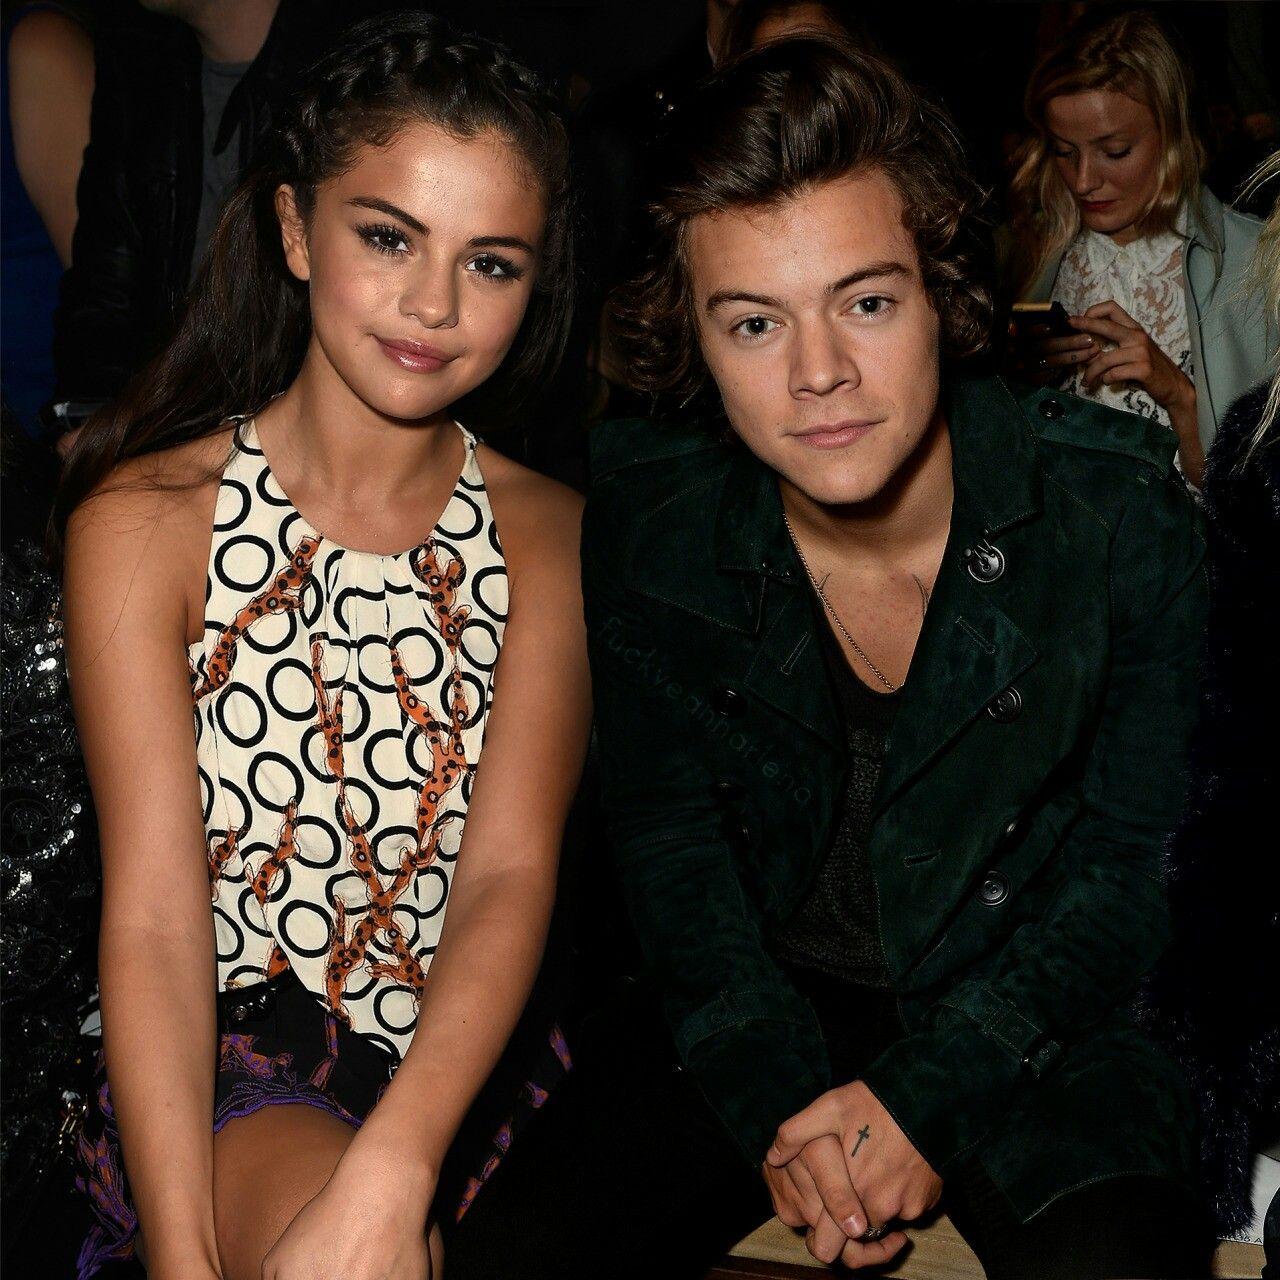 Harlena Love #Tumblr Harlena | Selena gomez, Harry styles ...